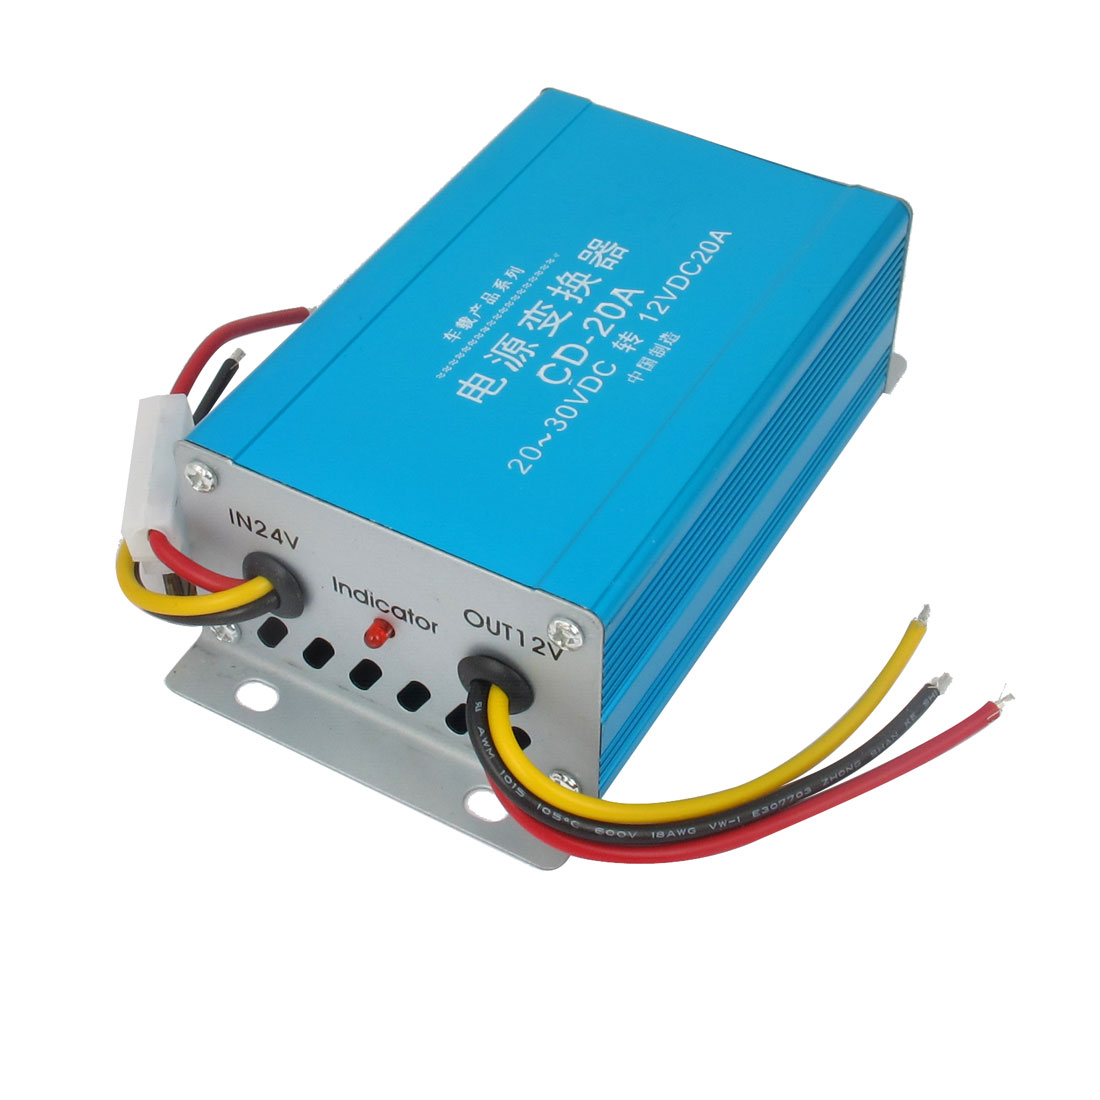 Car Auto Blue Shell Pre-wired DC 24-30V to DC 12V 20A Voltage Power Inverter Transformer